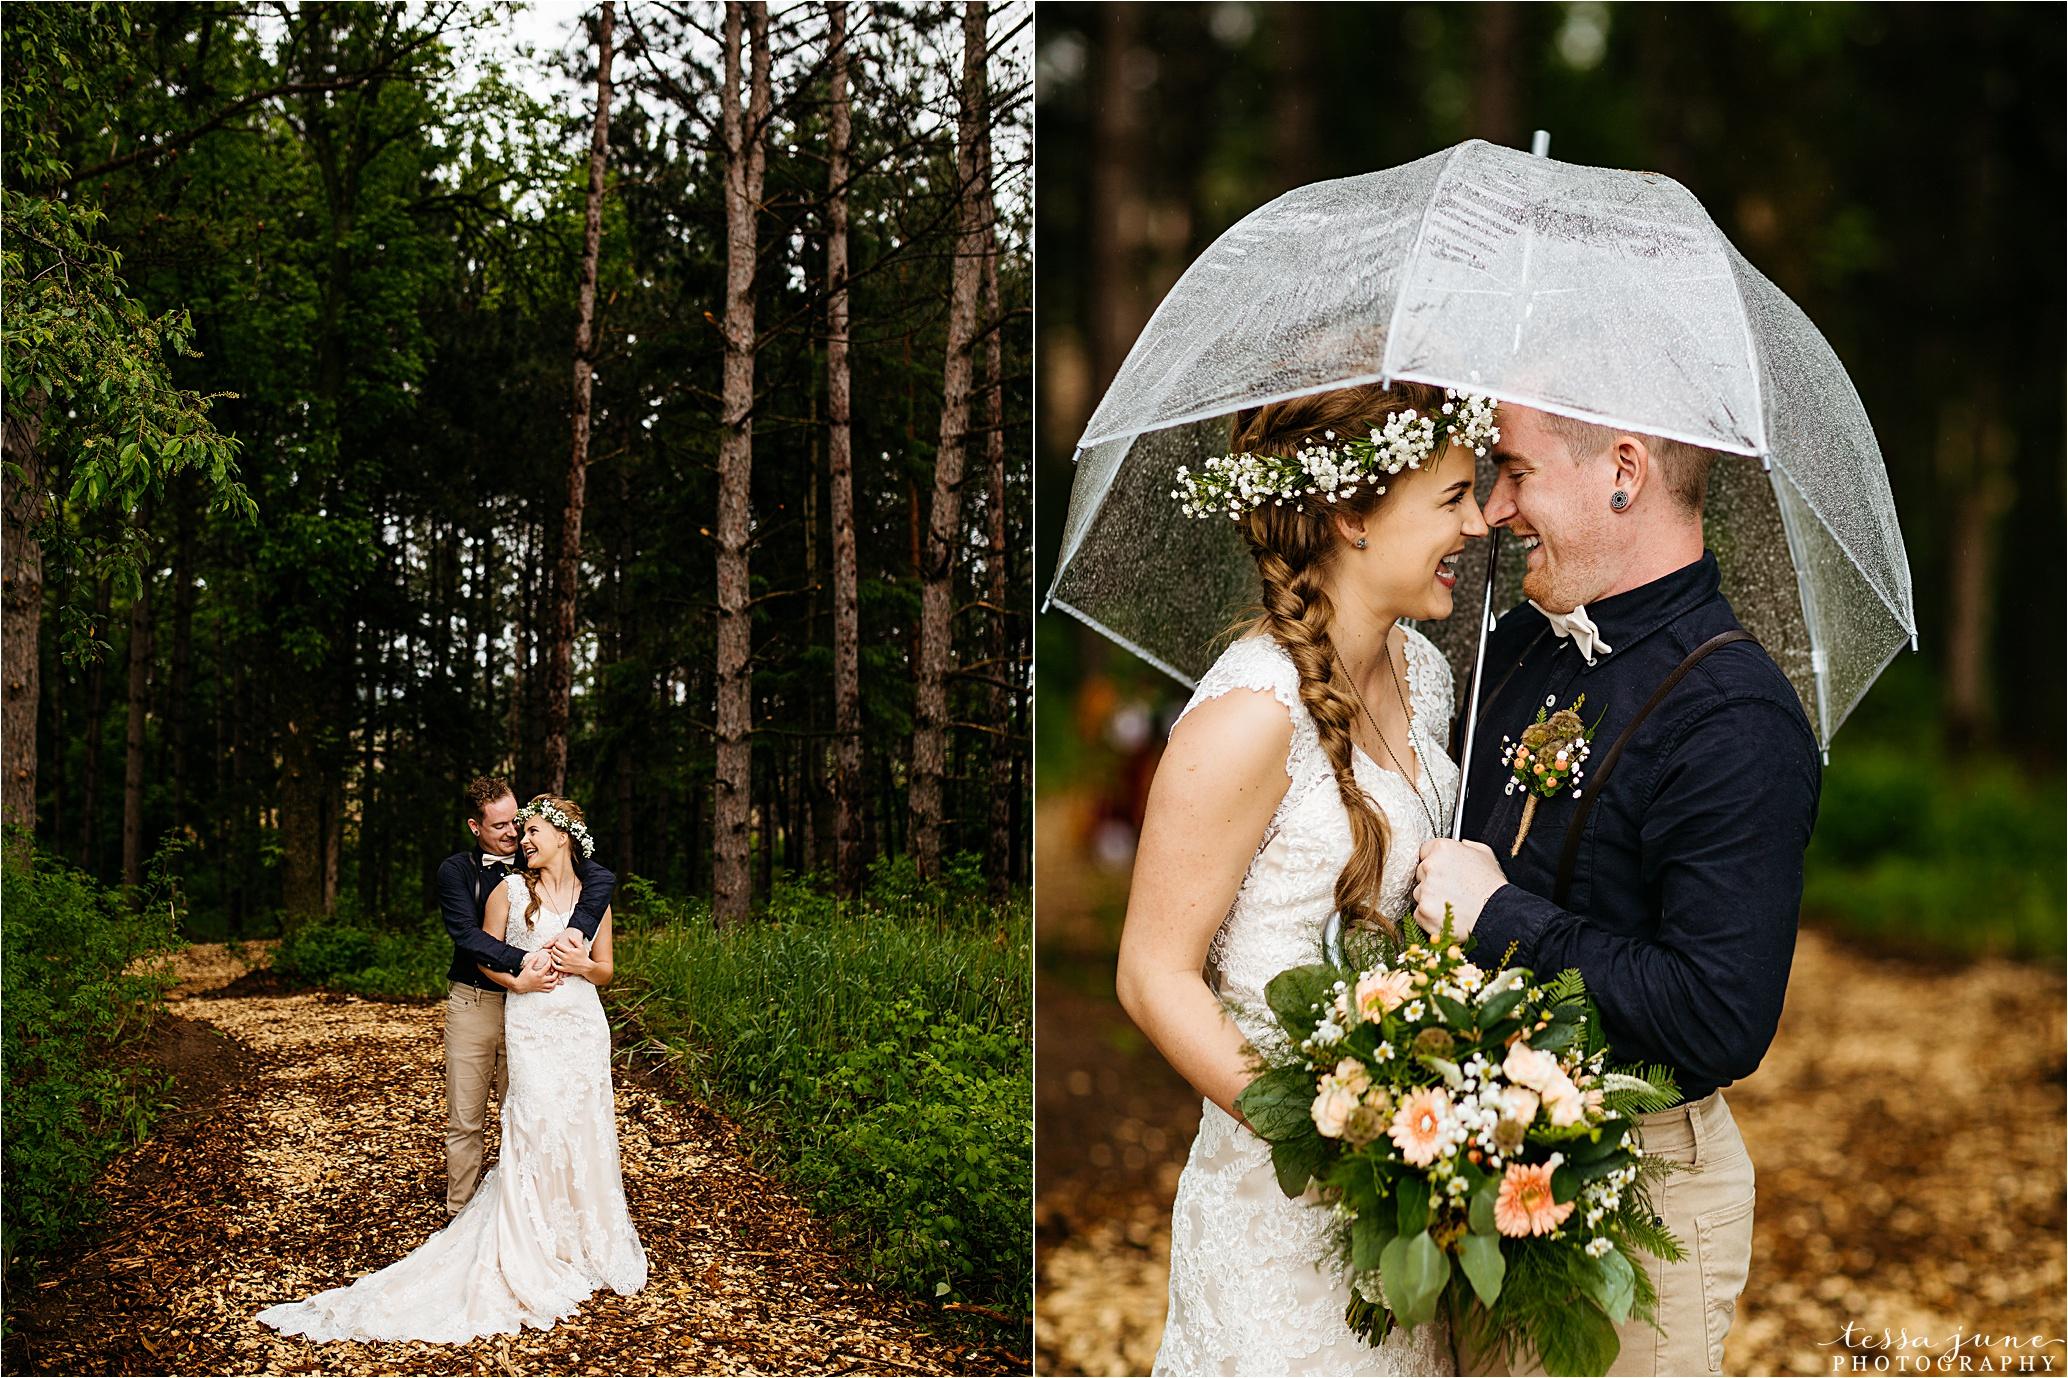 bohemian-forest-wedding-stillwater-minnesota-flower-crown-st-cloud-photographer-rain-umbrella